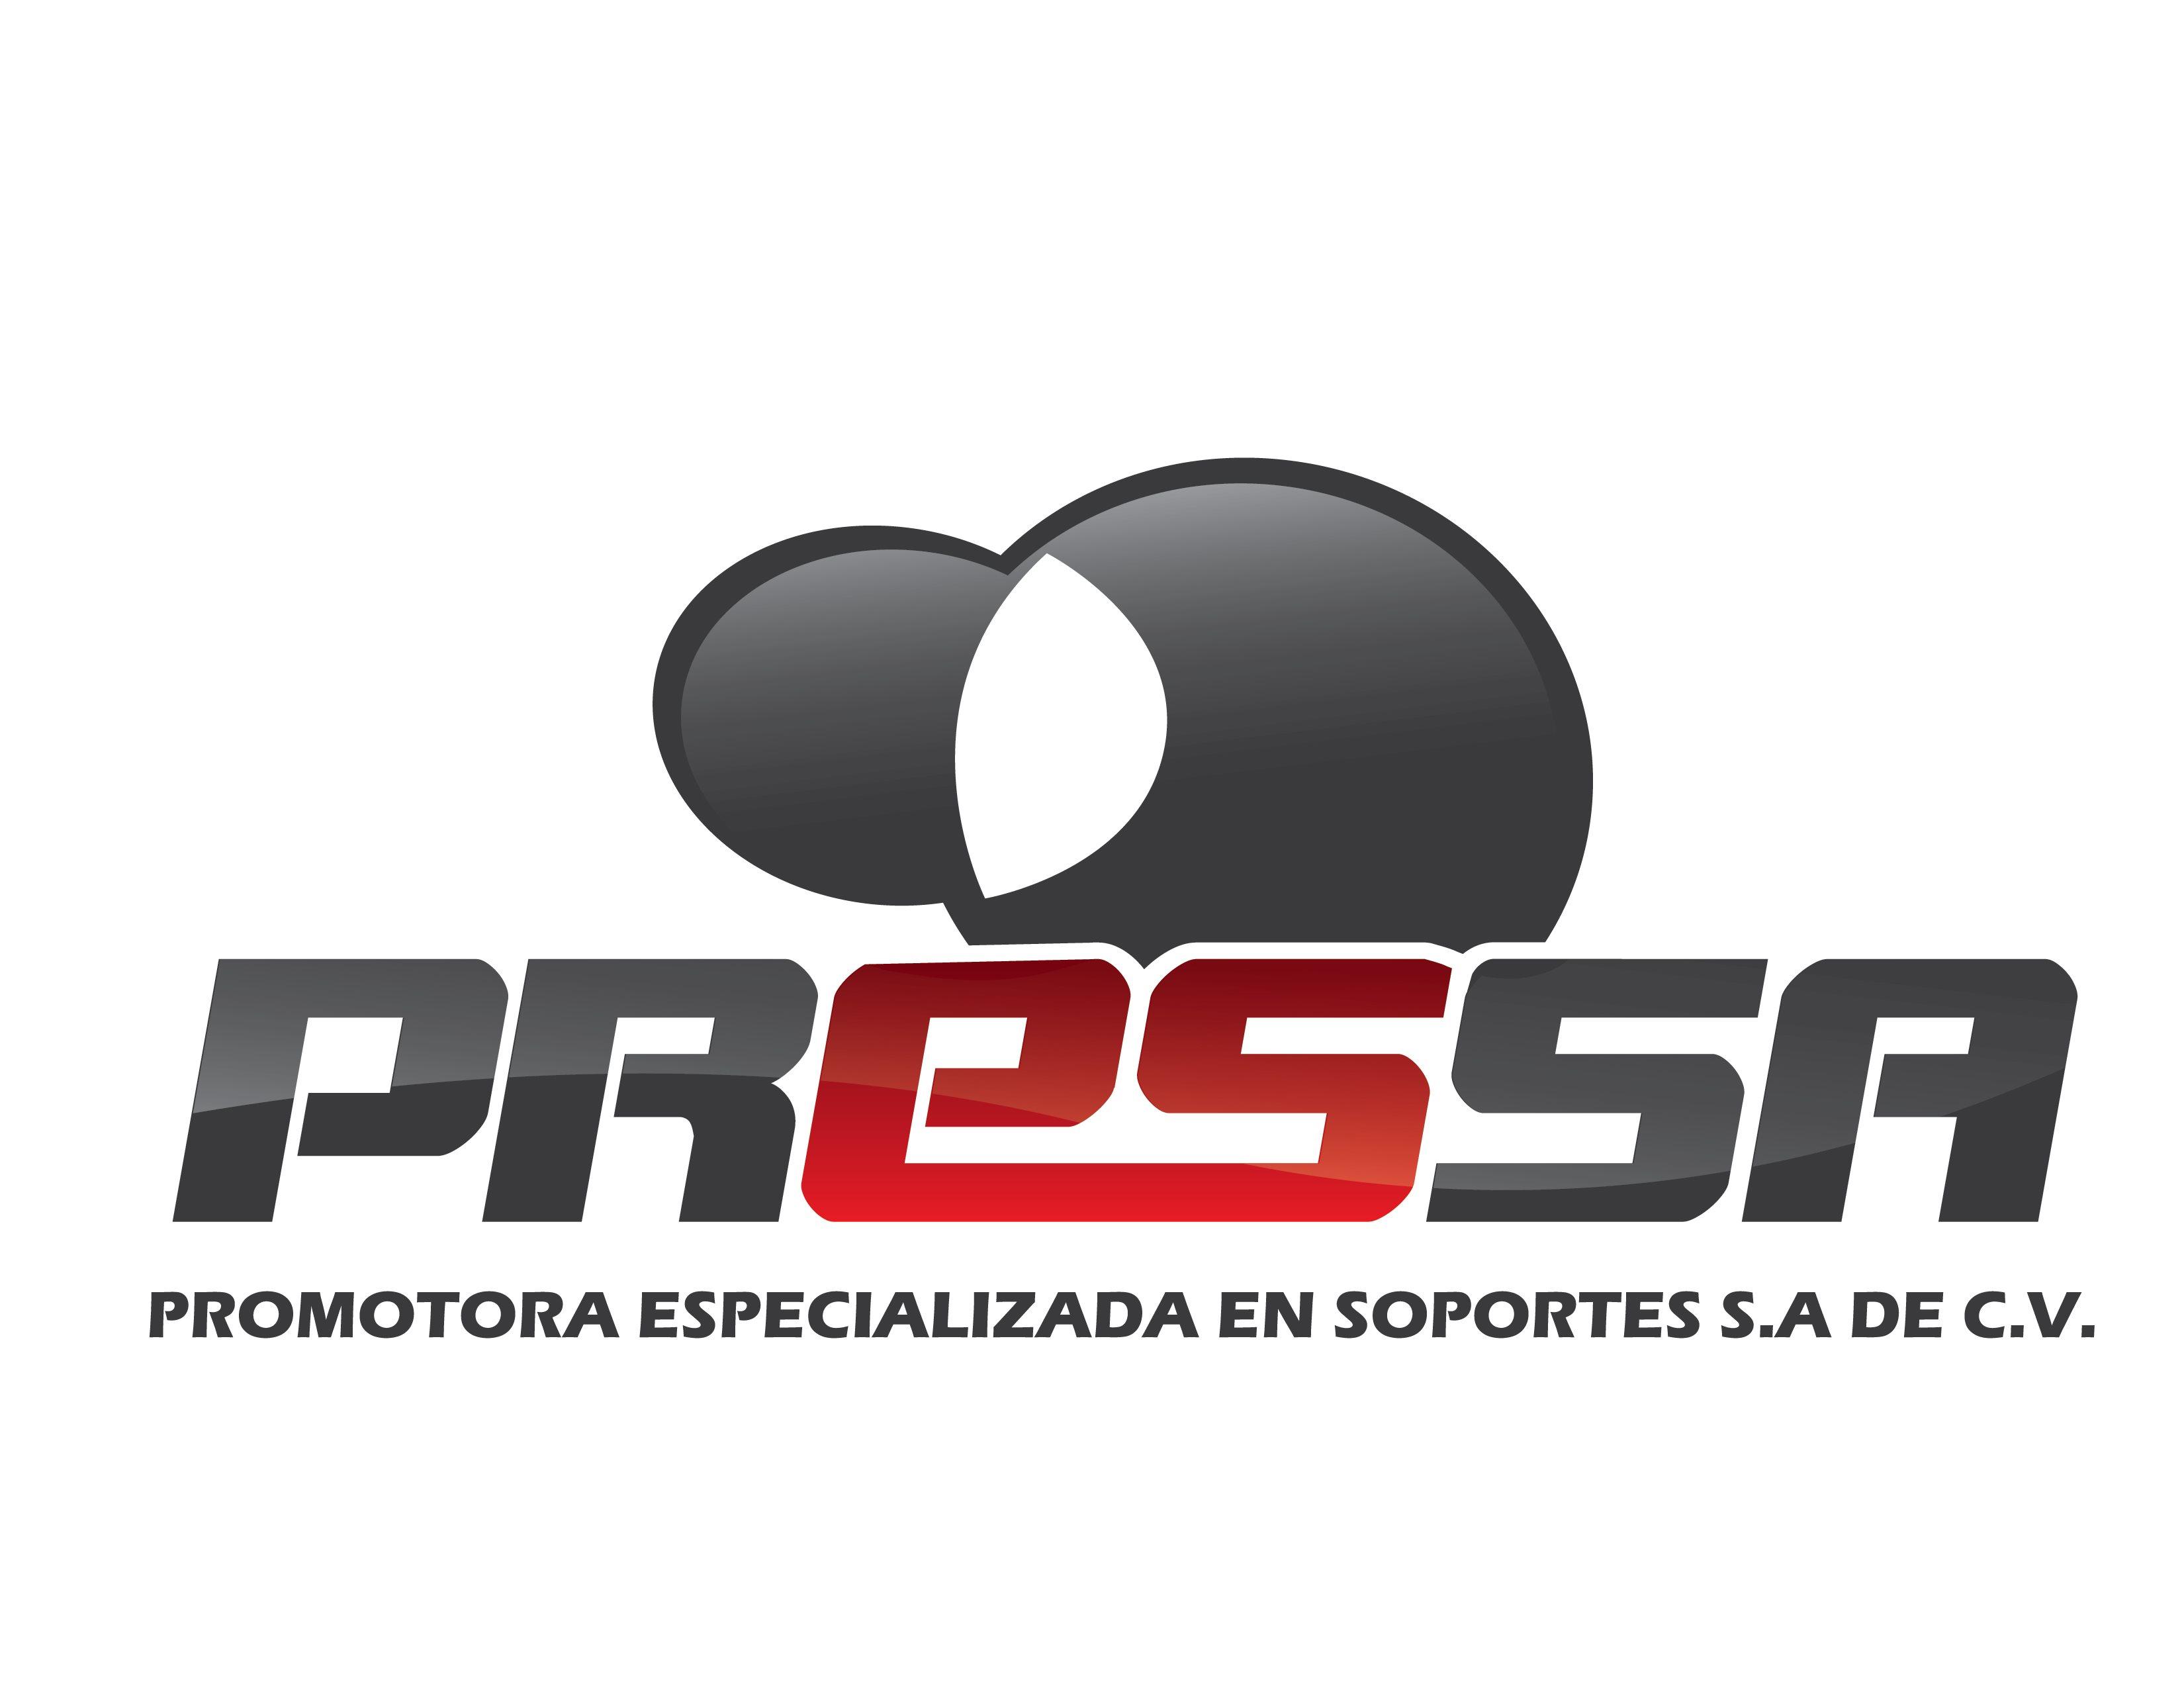 PROMOTORA ESPECIALIZADA EN SOPORTES, S.A. DE C.V.